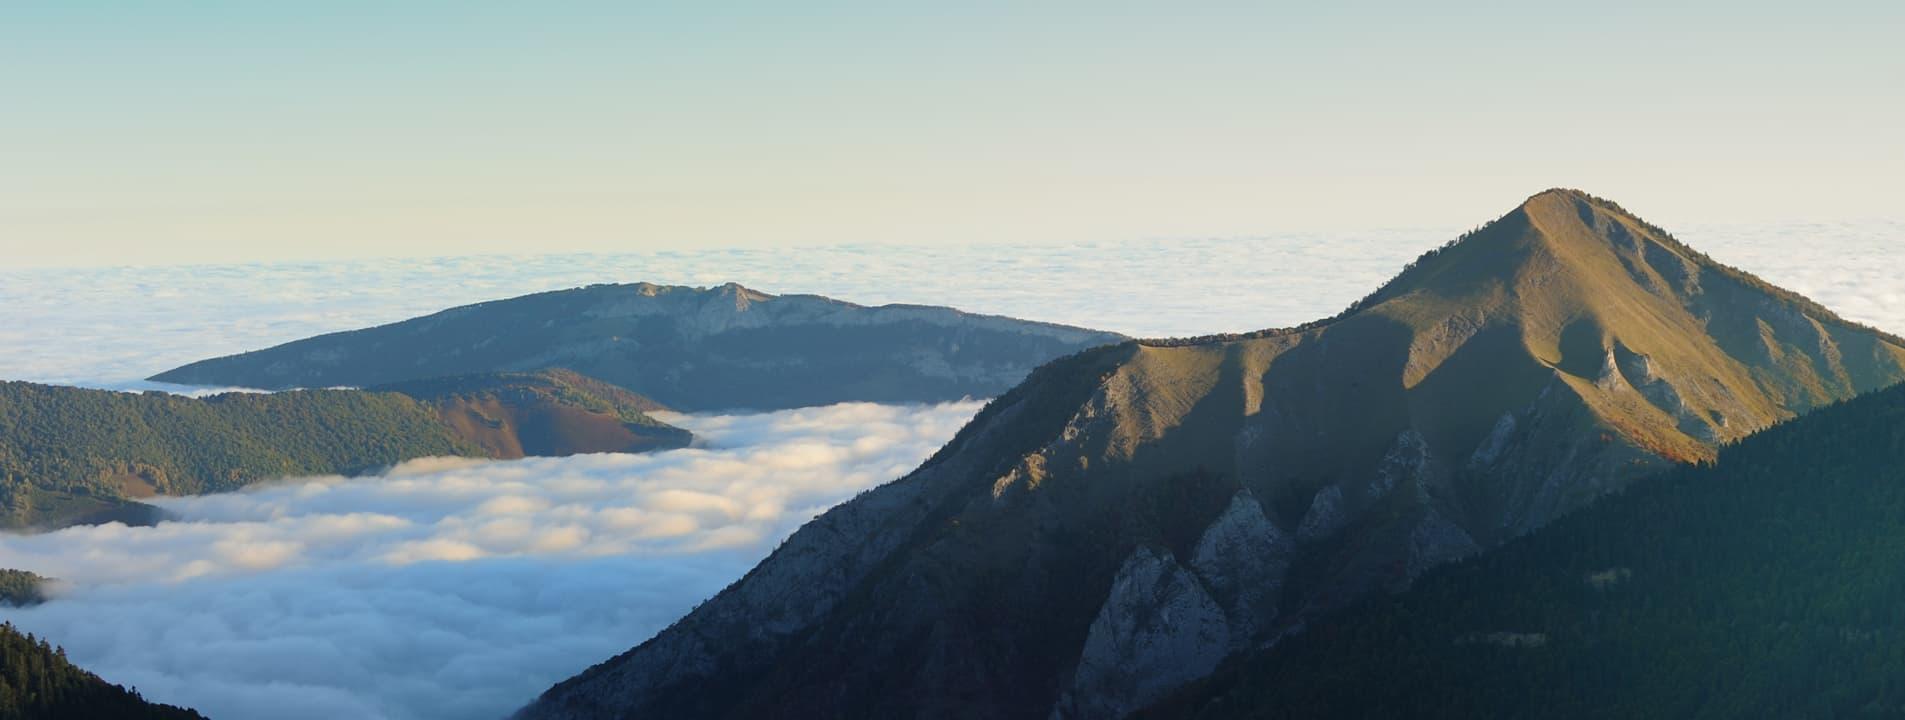 montagne_barousse